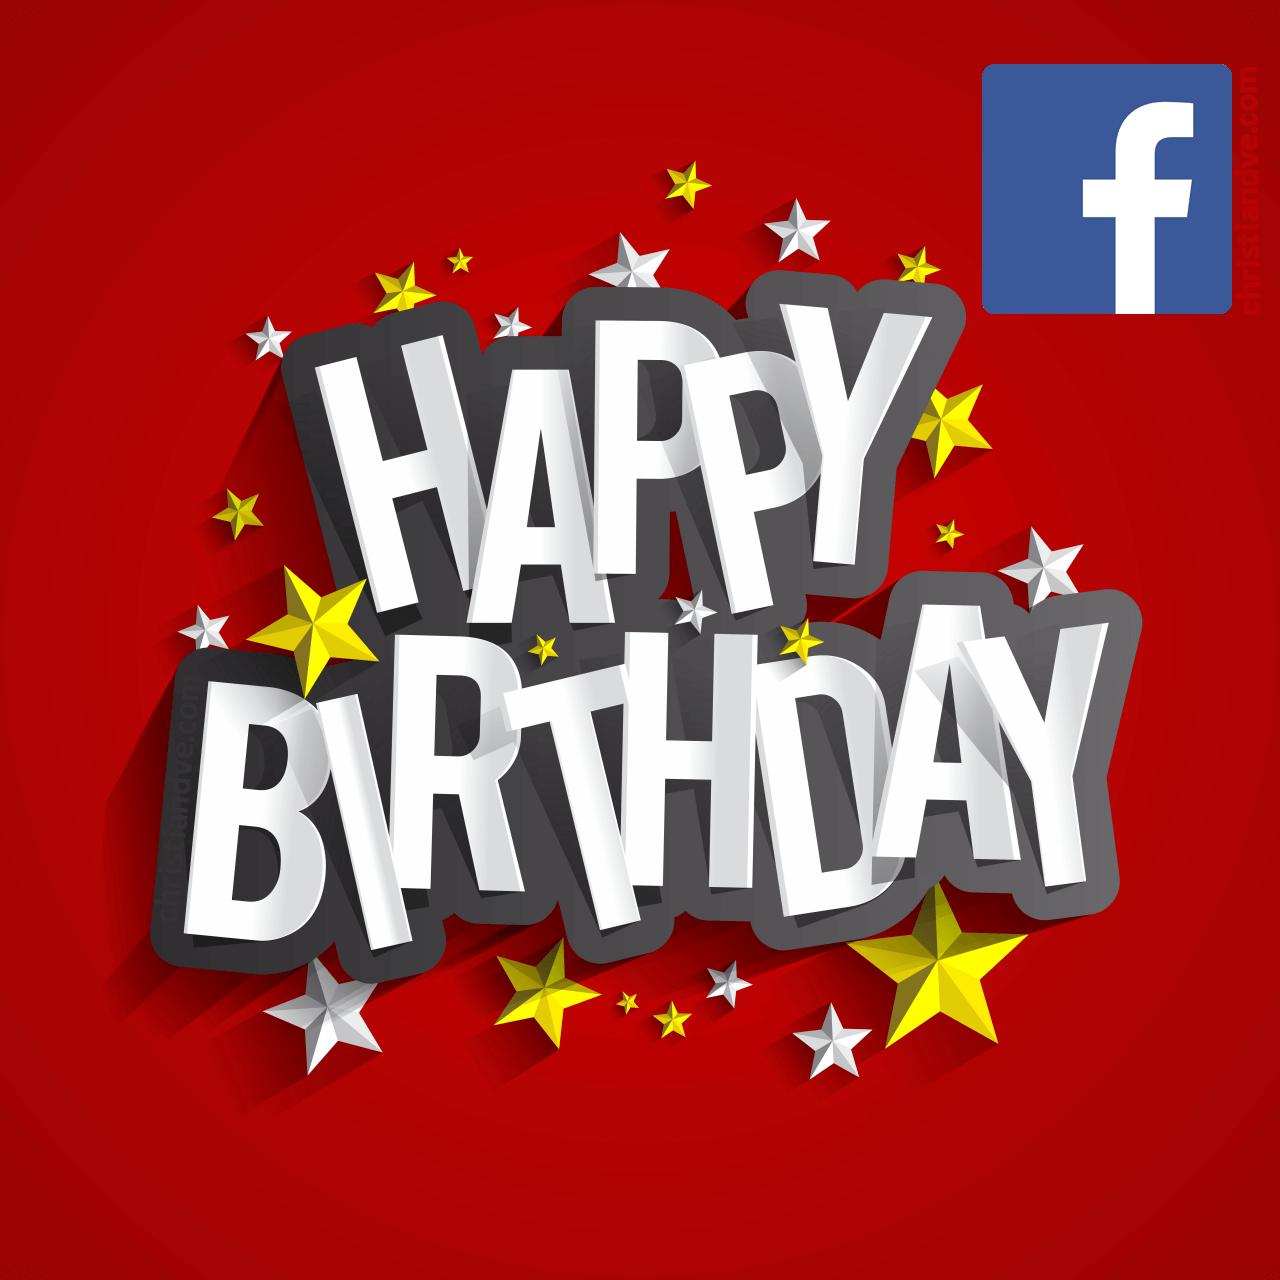 Como desear feliz cumpleanos en facebook